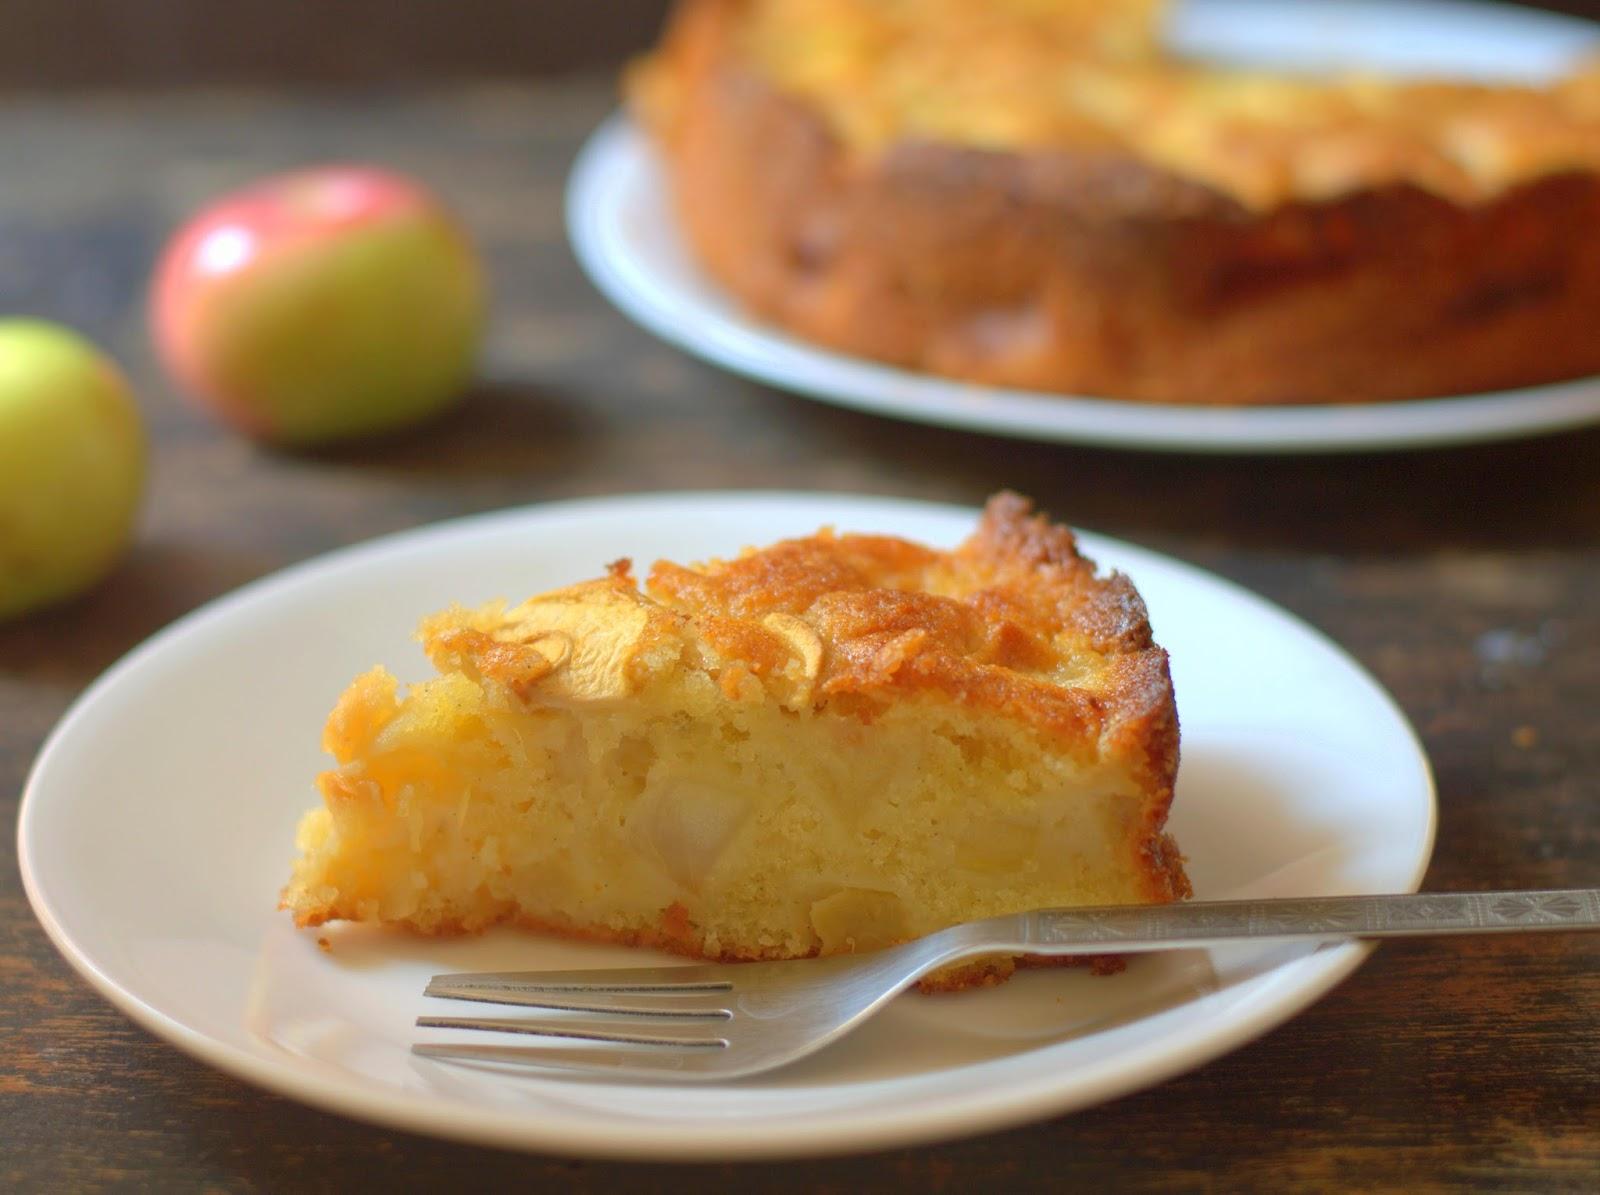 Dorie Greenspan Apple Streusel Bundt Cake